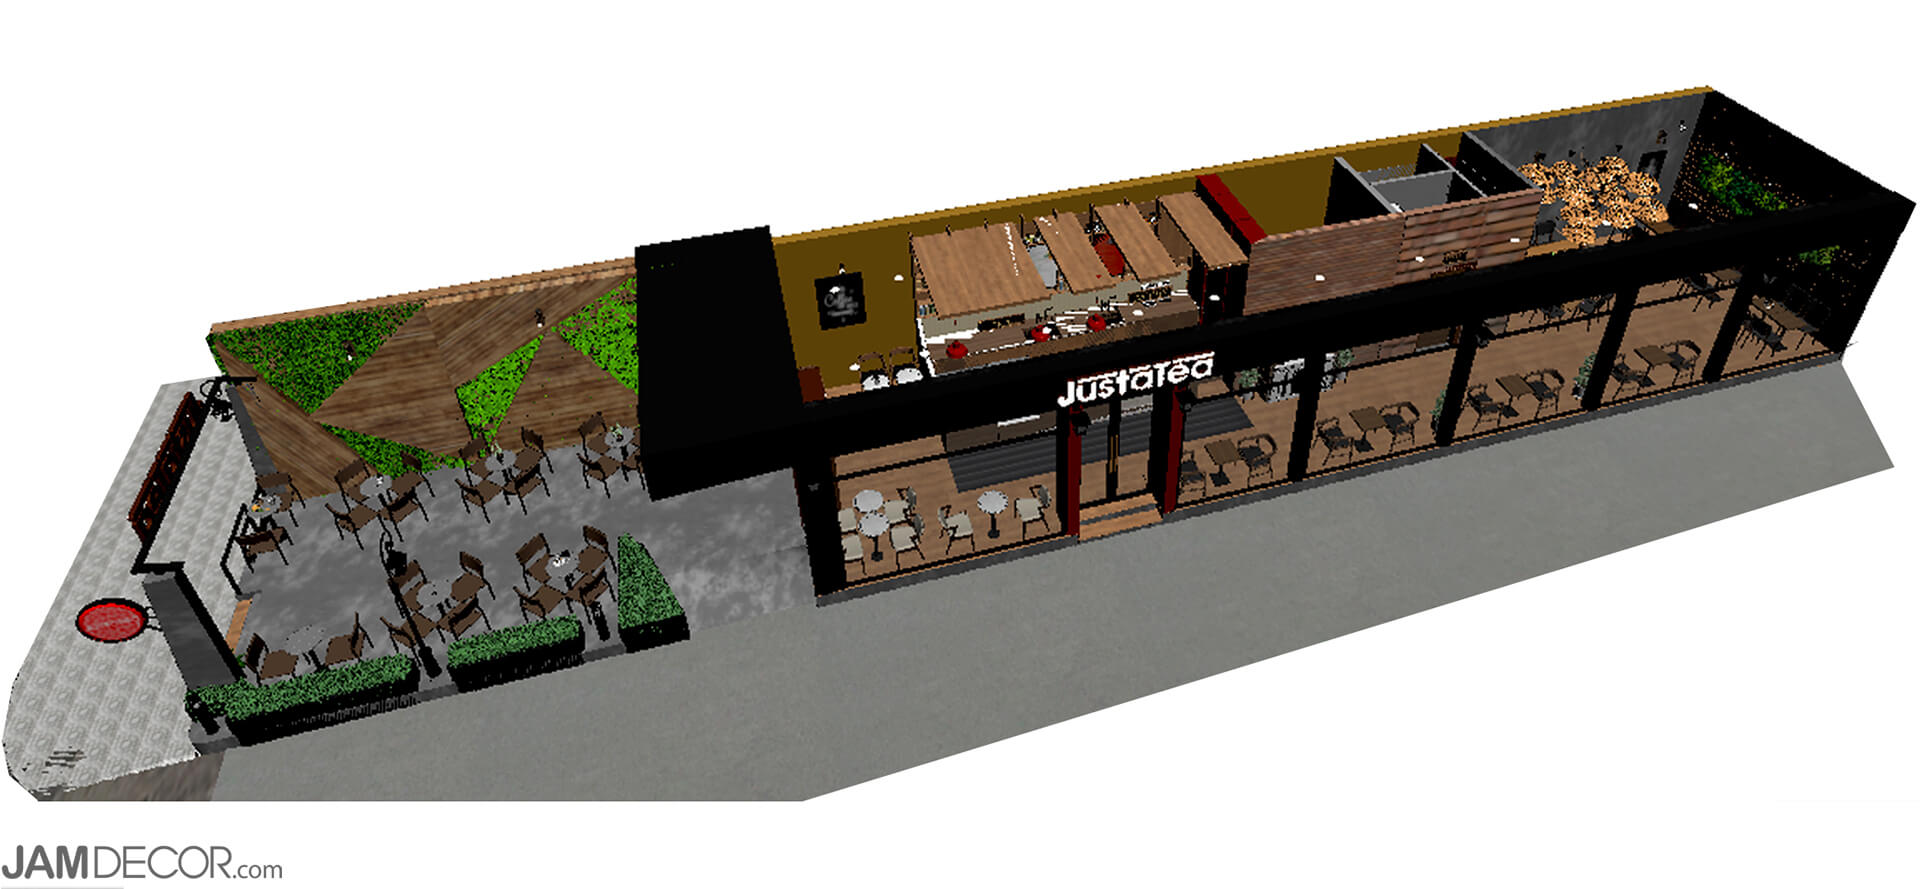 JustATea-1